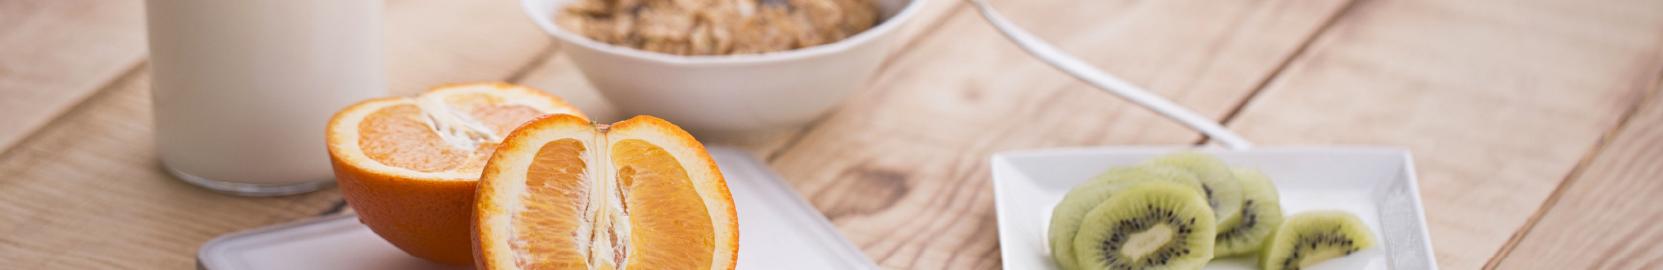 Slider Regulador intestinal fruta